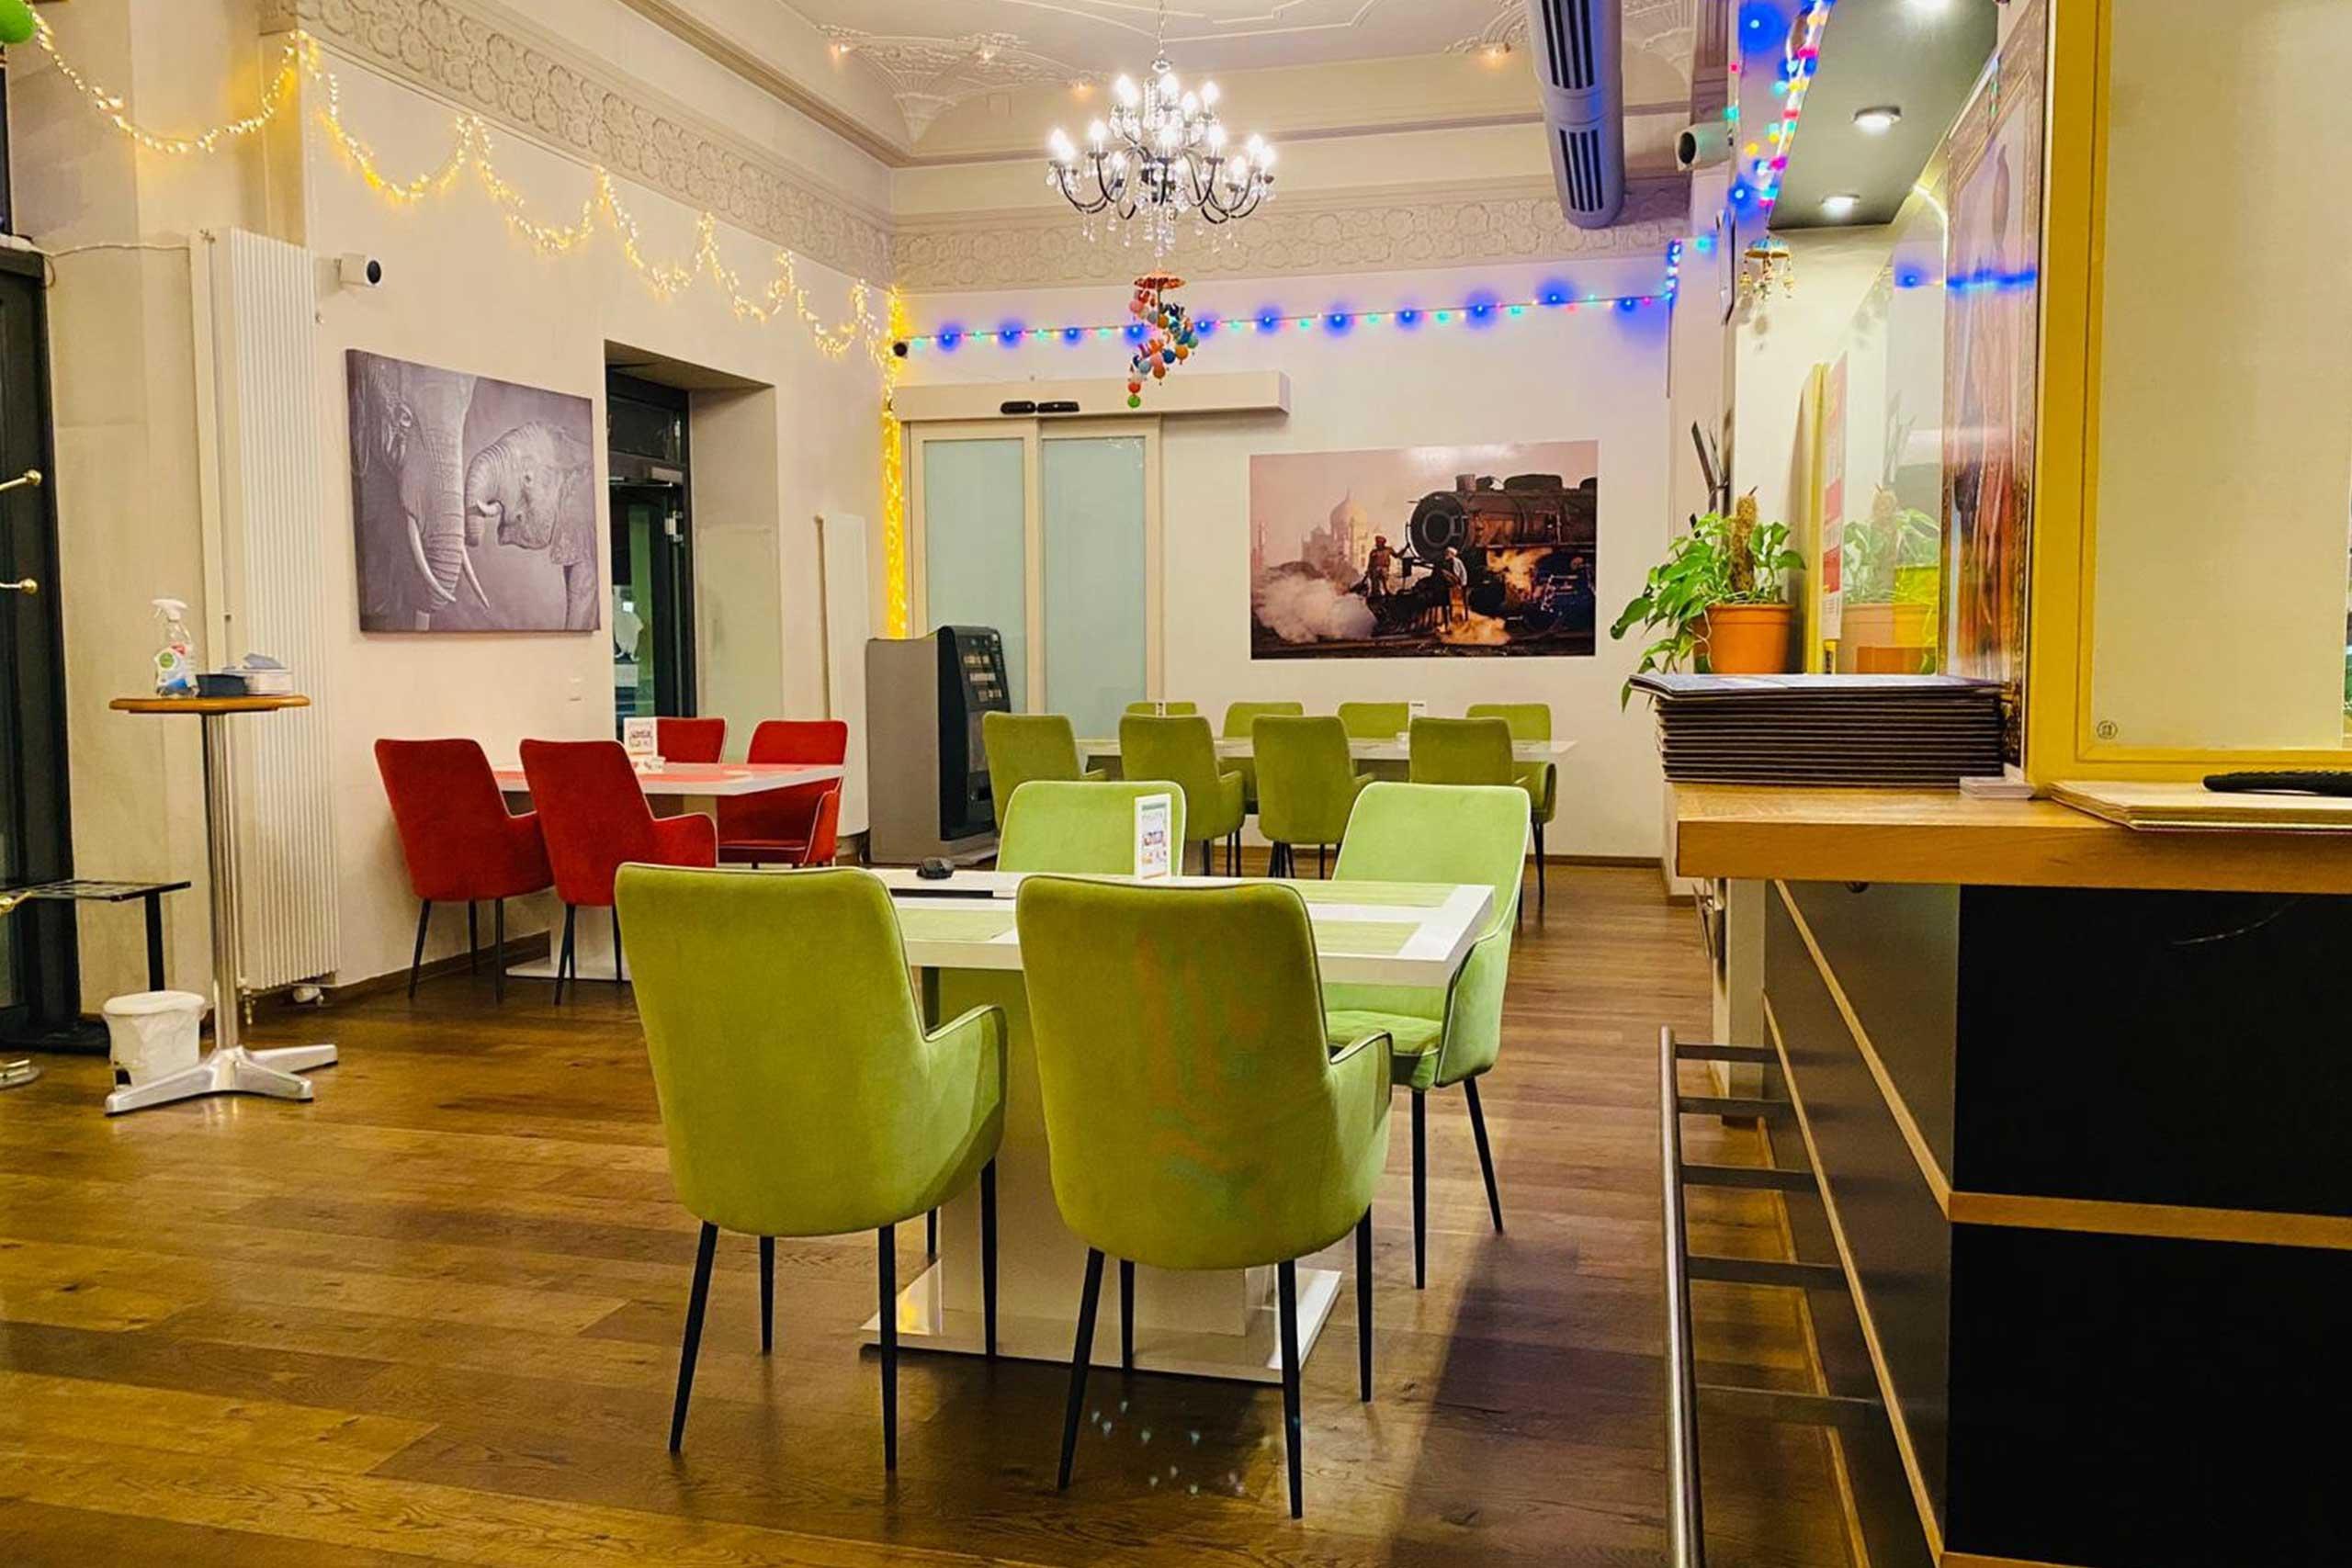 delh-darbar-indian-restaurant-speisesaal-3.jpg